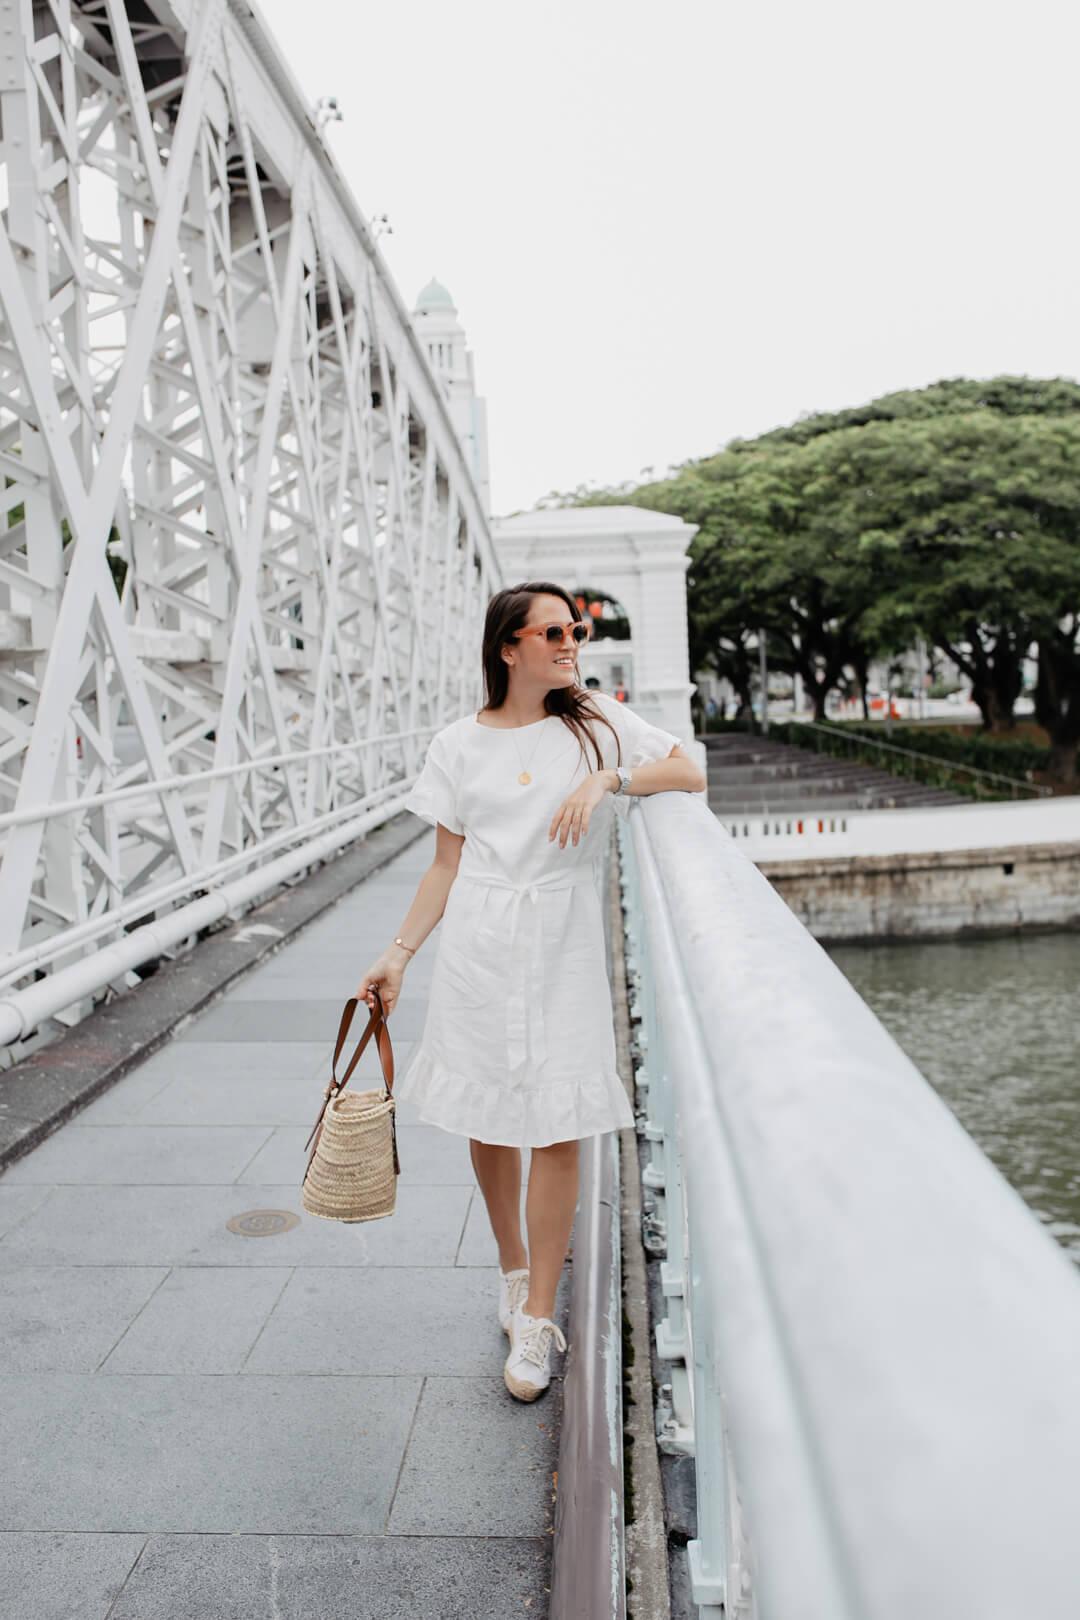 Meine Highlights in Singapur // Pieces of Mariposa - Lifestyle Blog aus Nürnberg